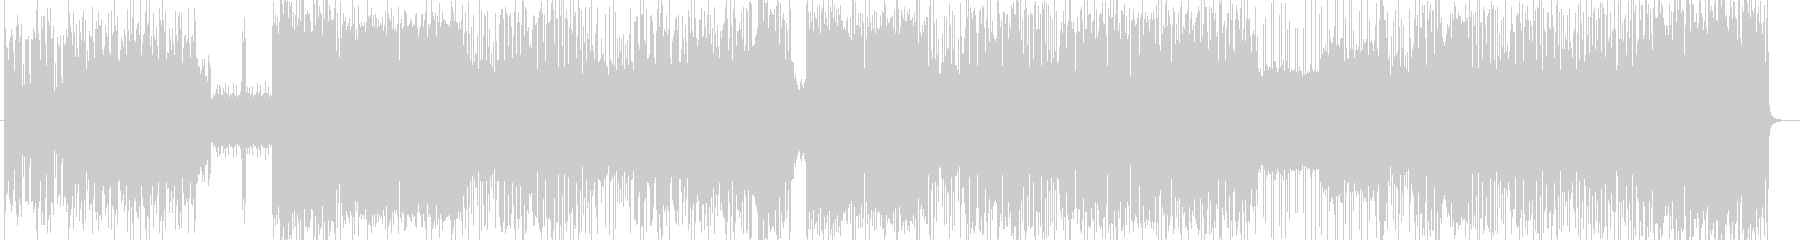 「HR/HM」「ROCK」BGM150の未再生の波形